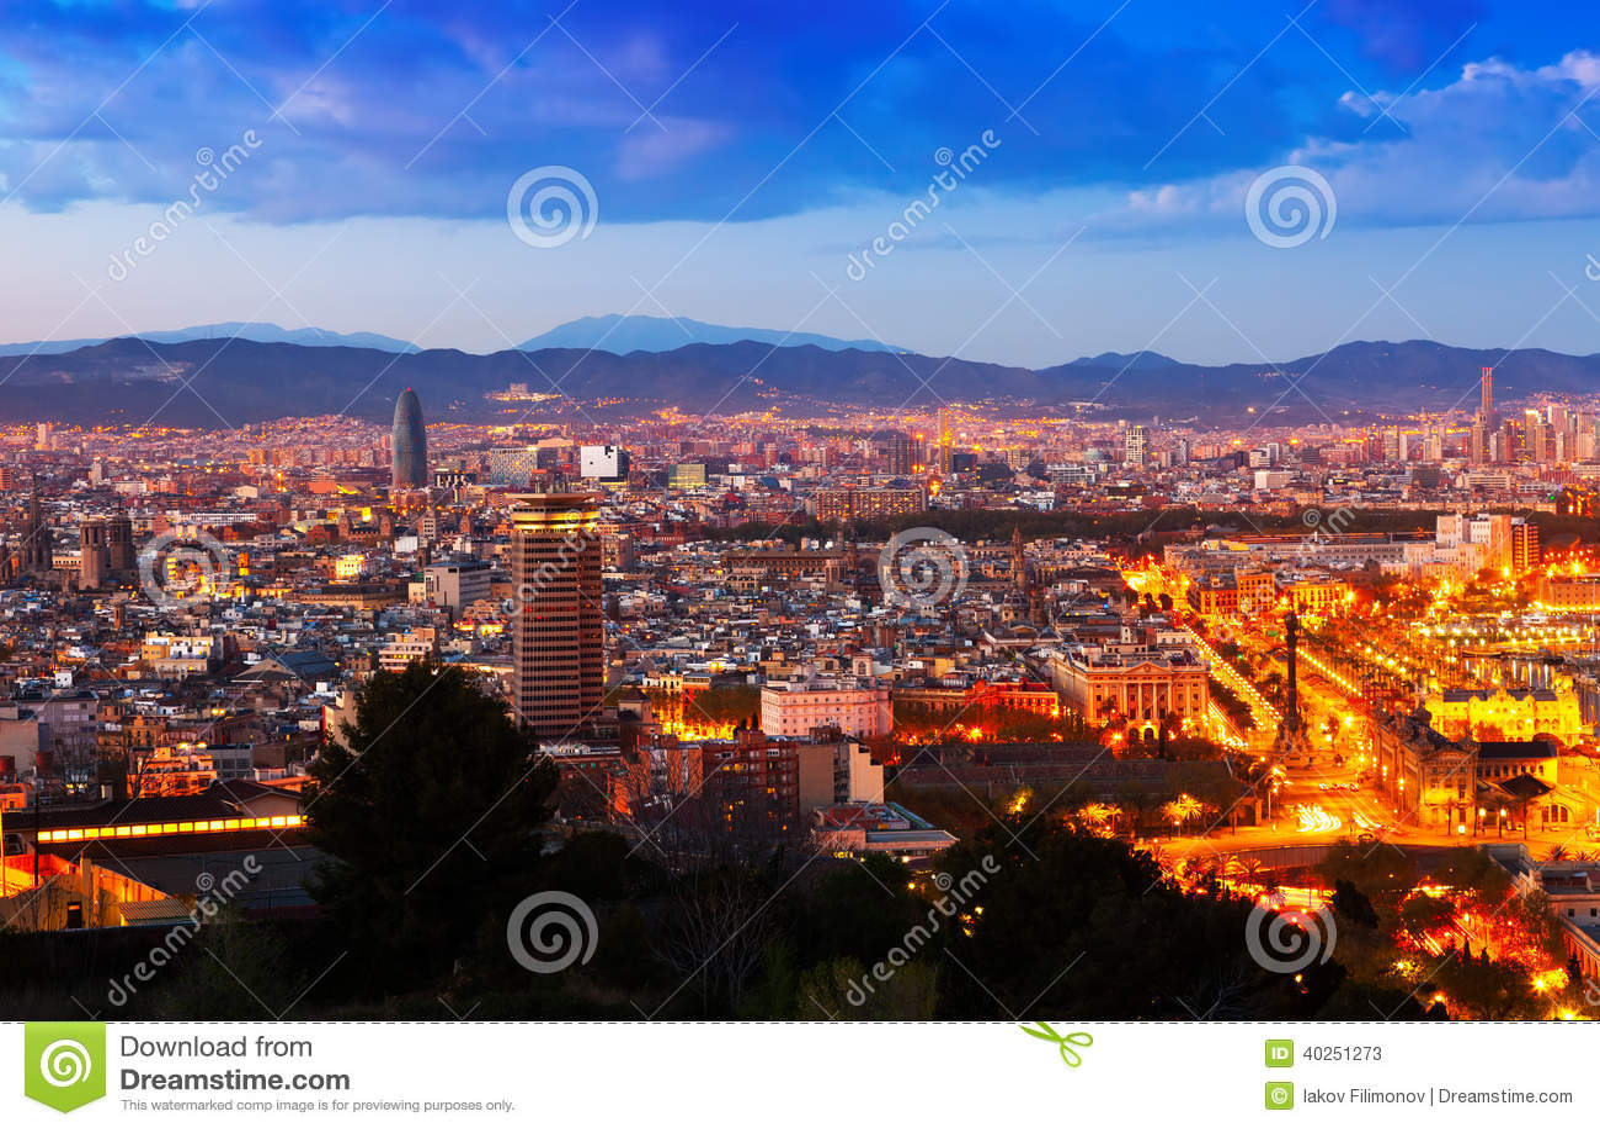 Barcelona city in night stock image. Image of illuminated ...